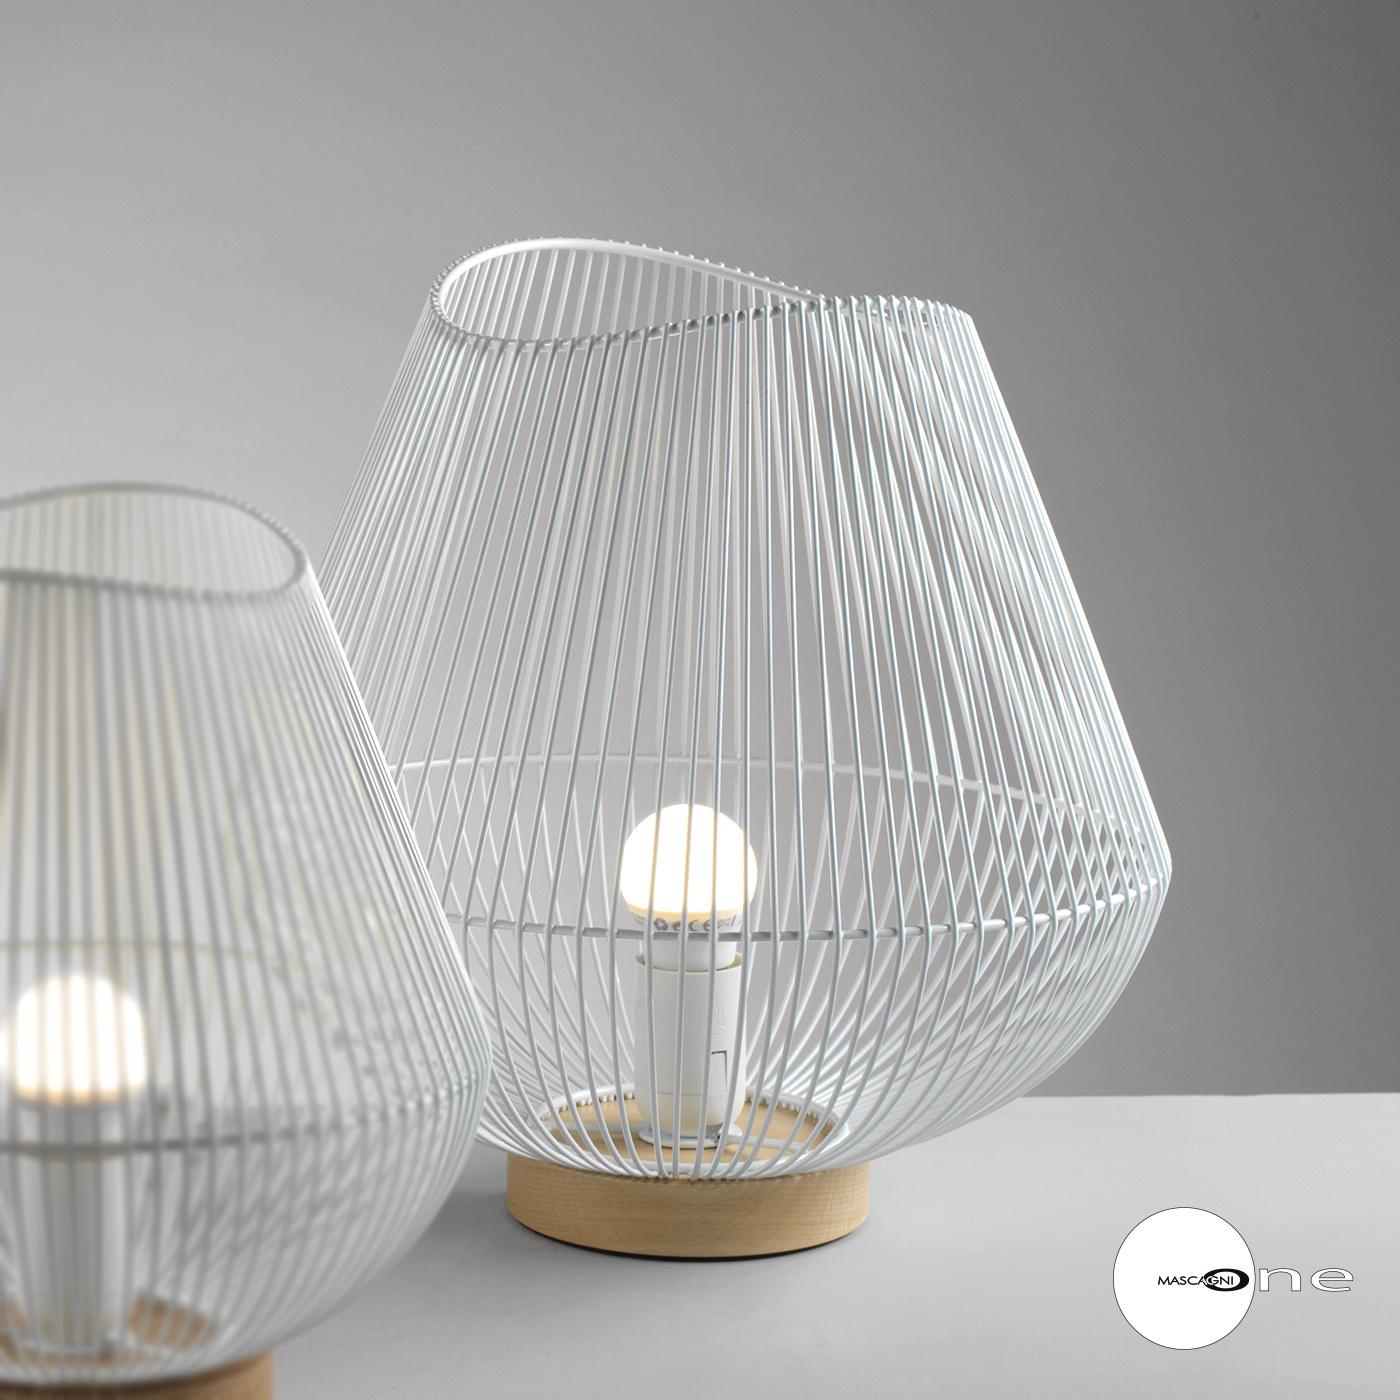 Art Mascagni O1553 LAMP DIAM.31,5 - COL.WHITE